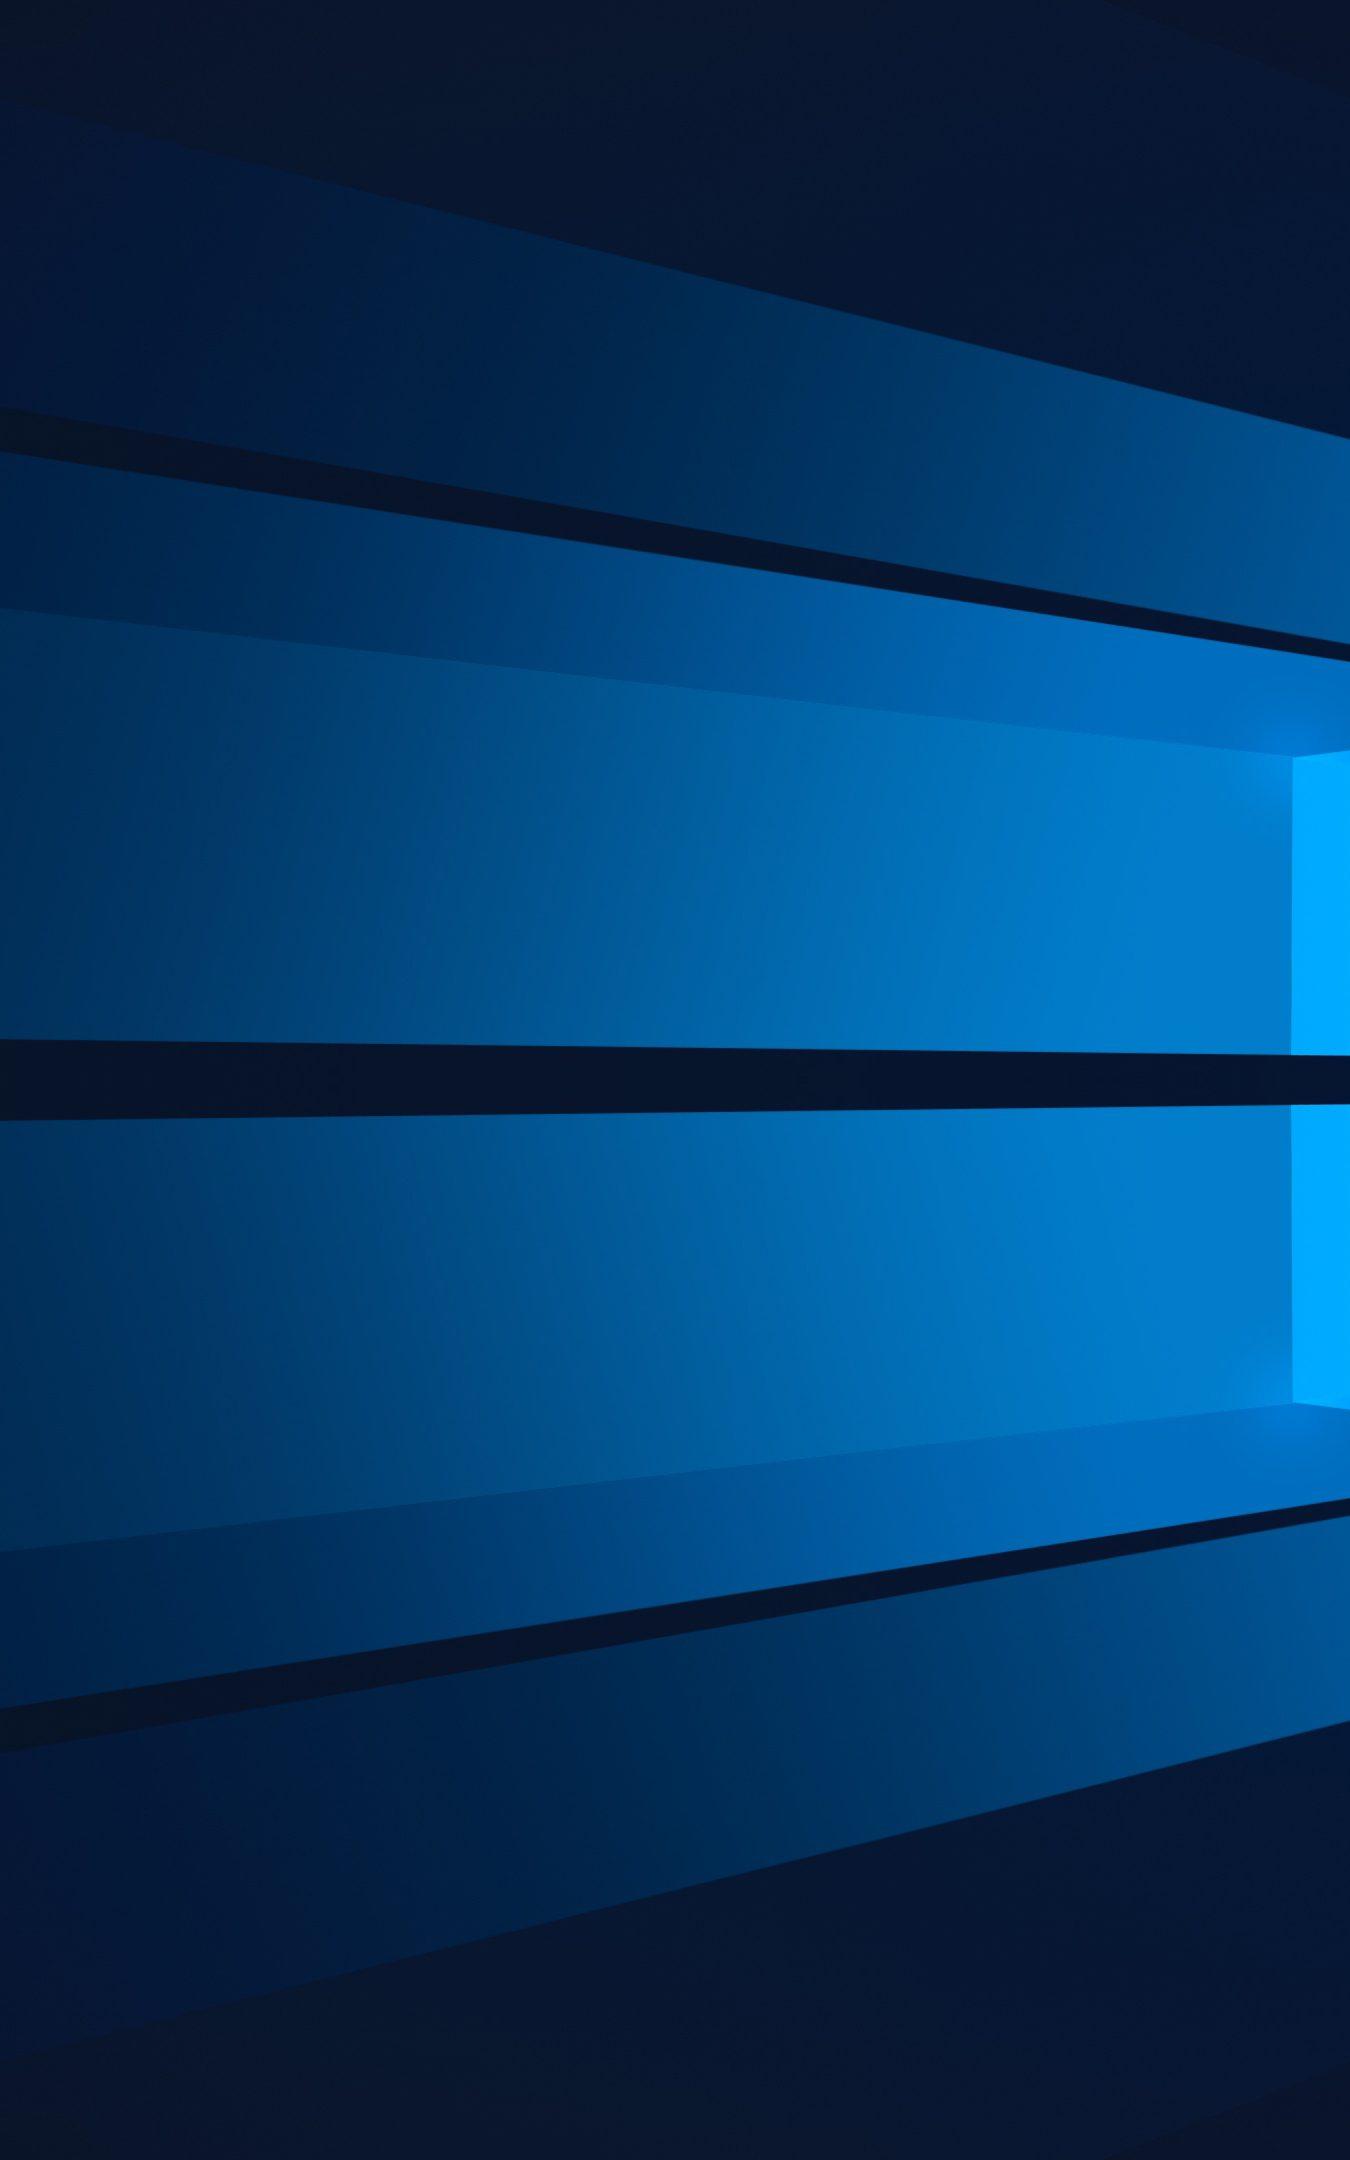 Flat blue windows 10 4k wallpaper best wallpapers - Windows 10 4k wallpaper pack ...